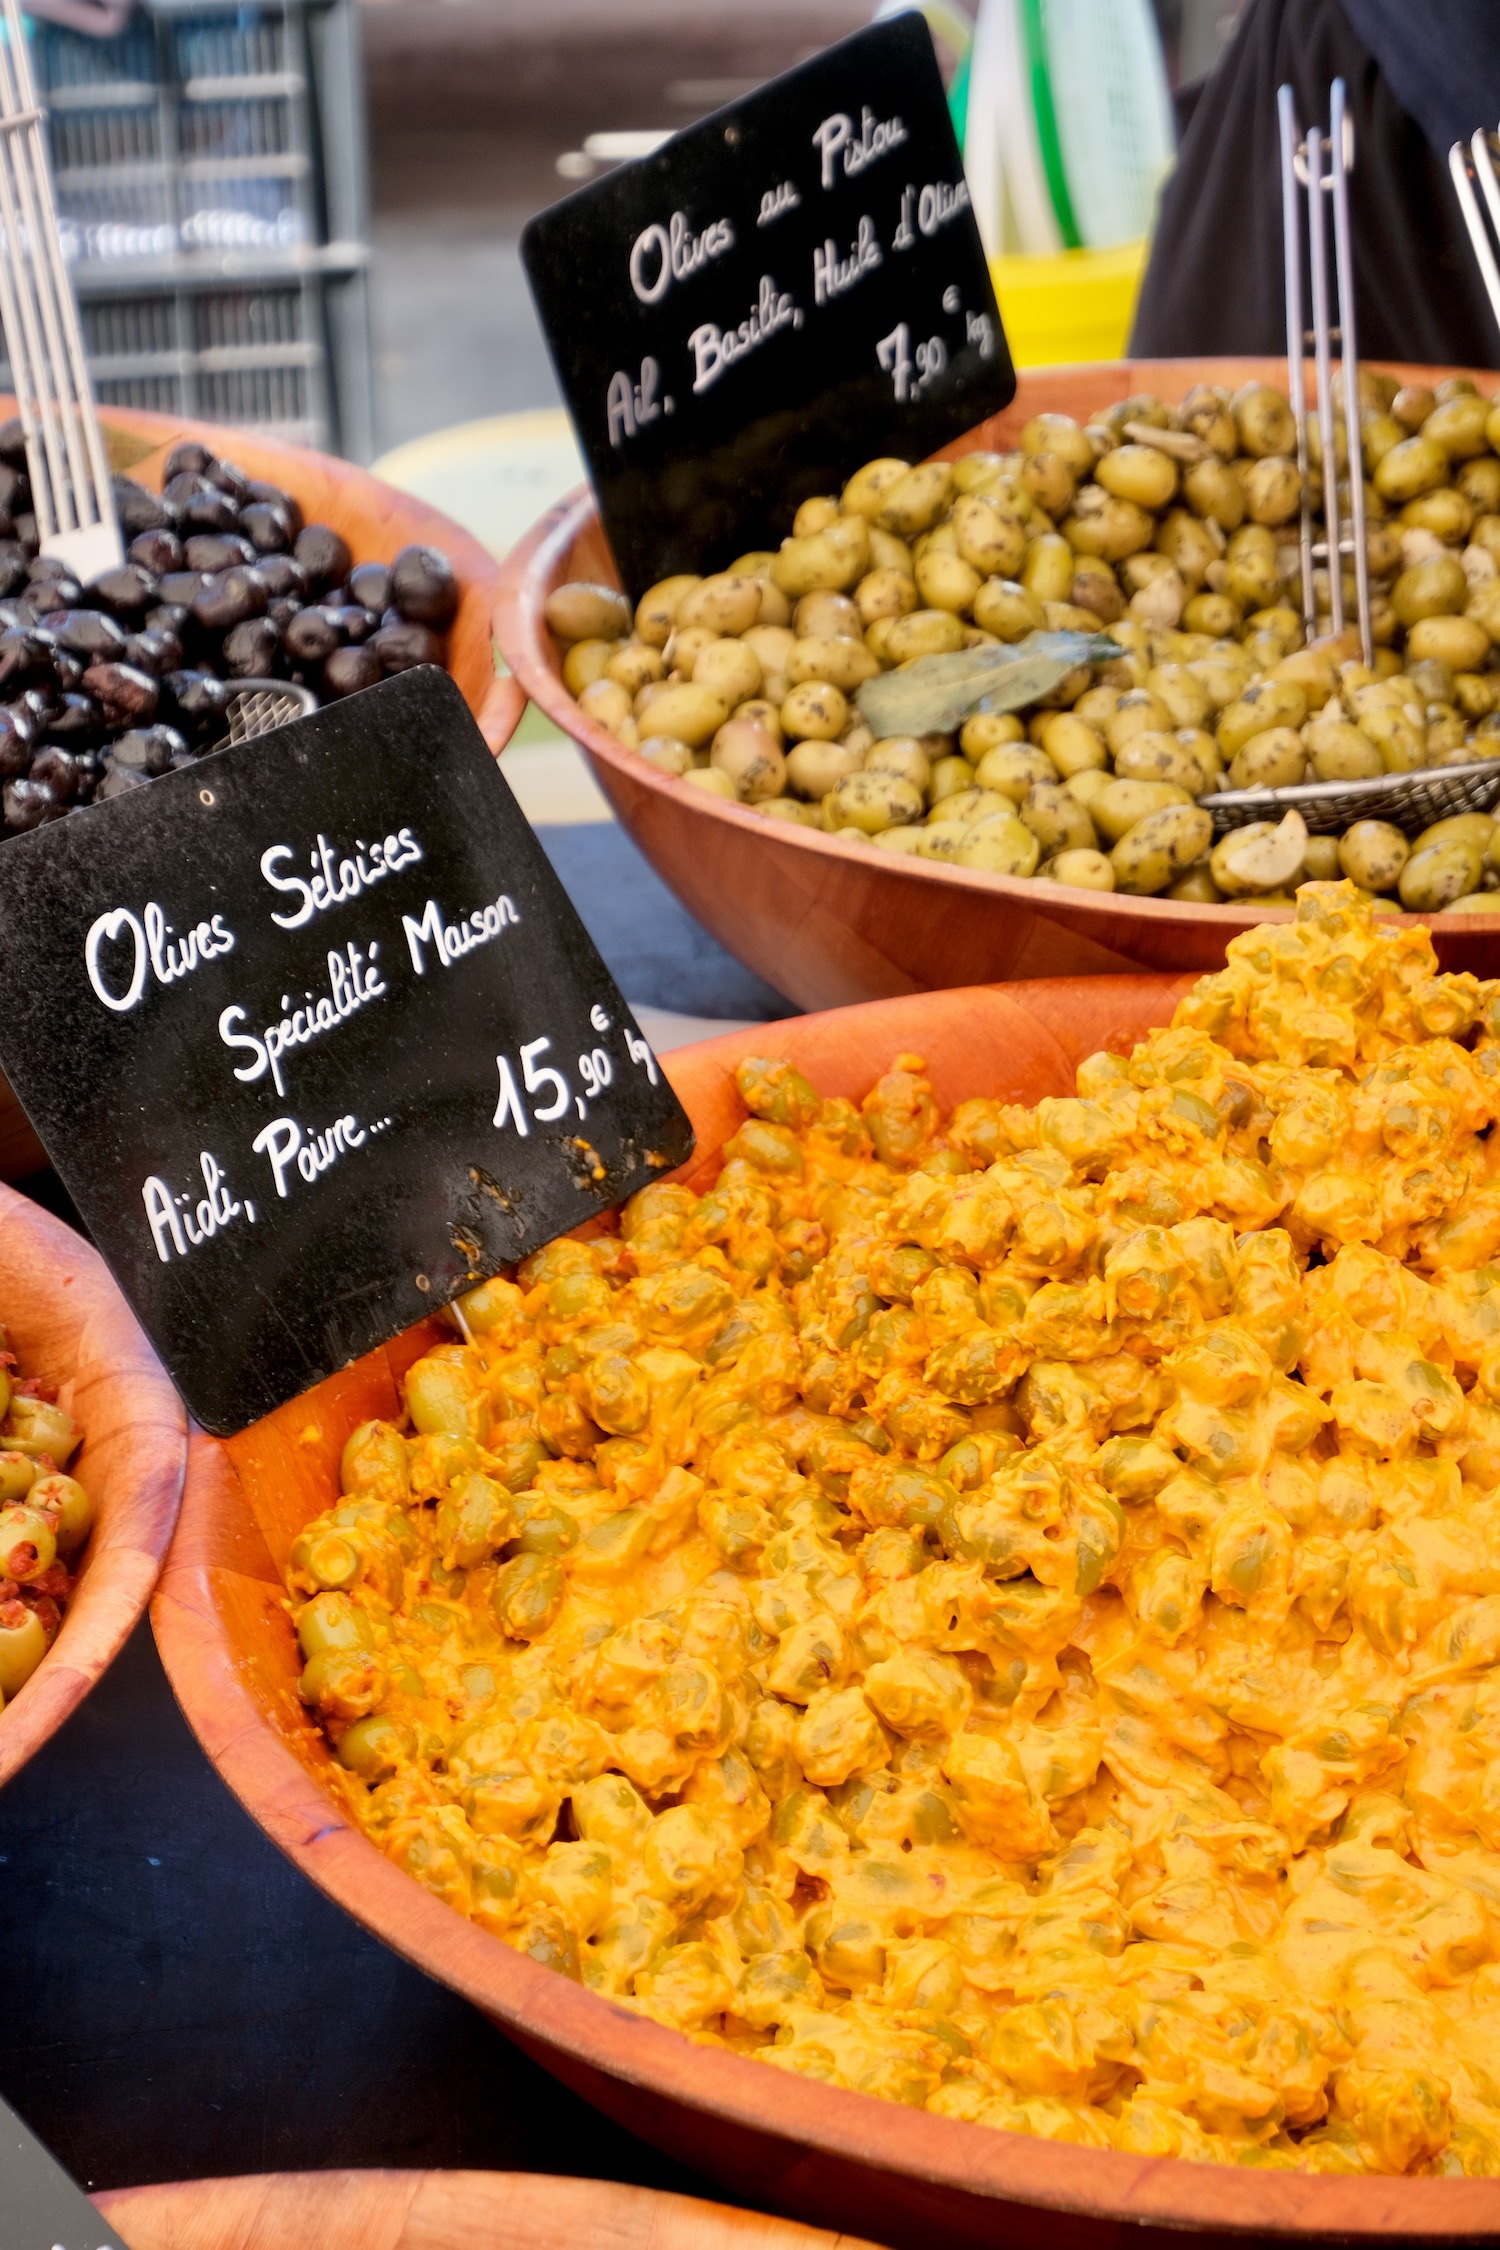 Olives Sétoises